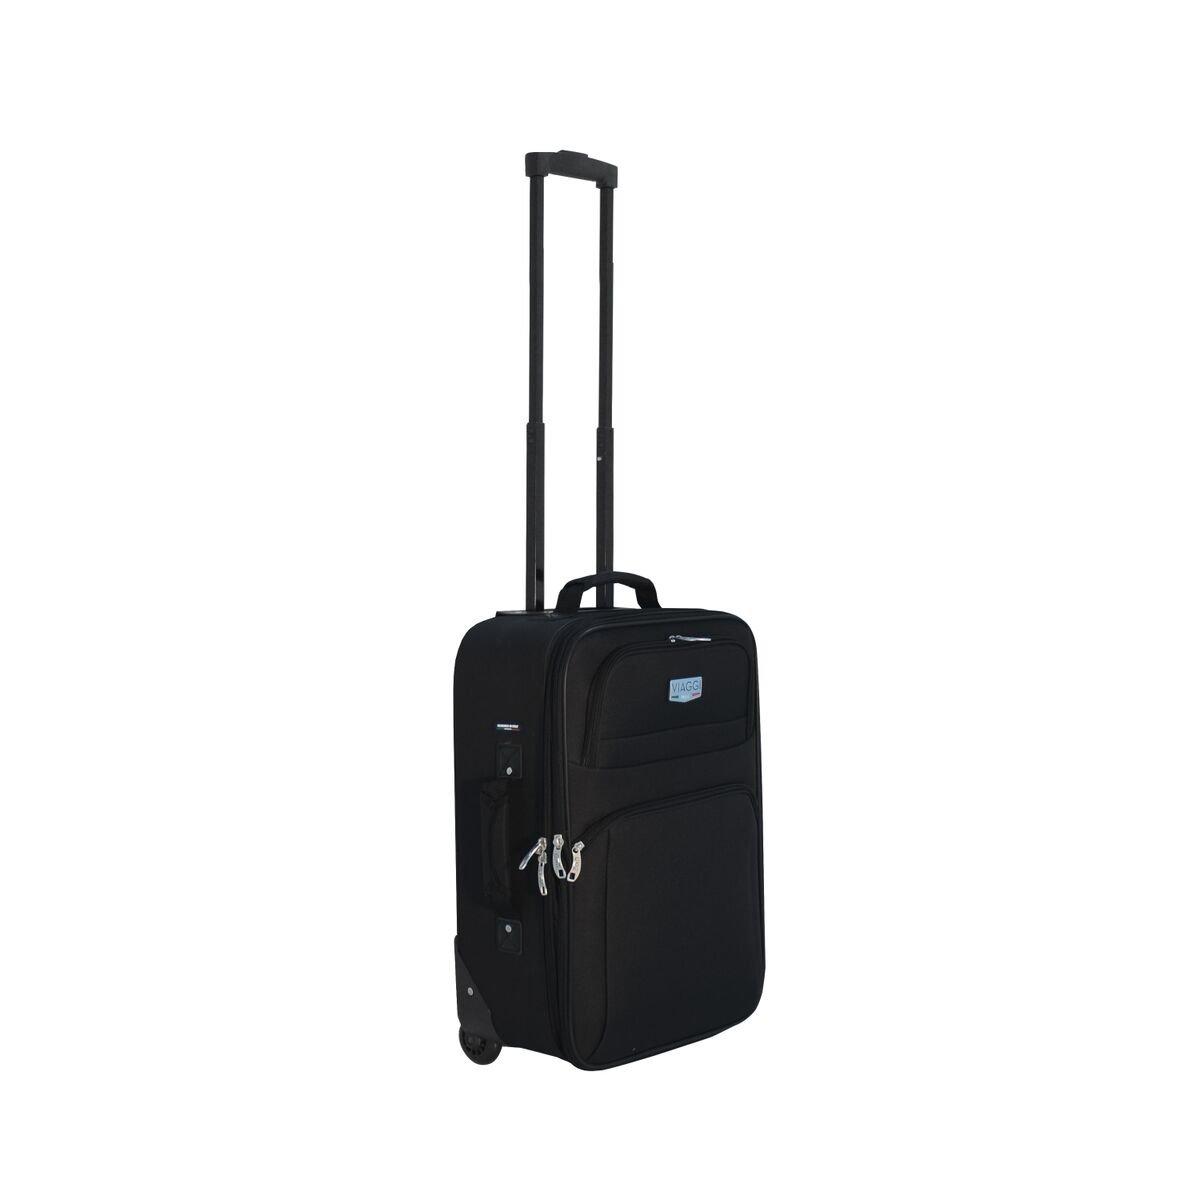 Viaggi 機内持ち込み手荷物, ブラック, One Size B07922TCZJ ブラック